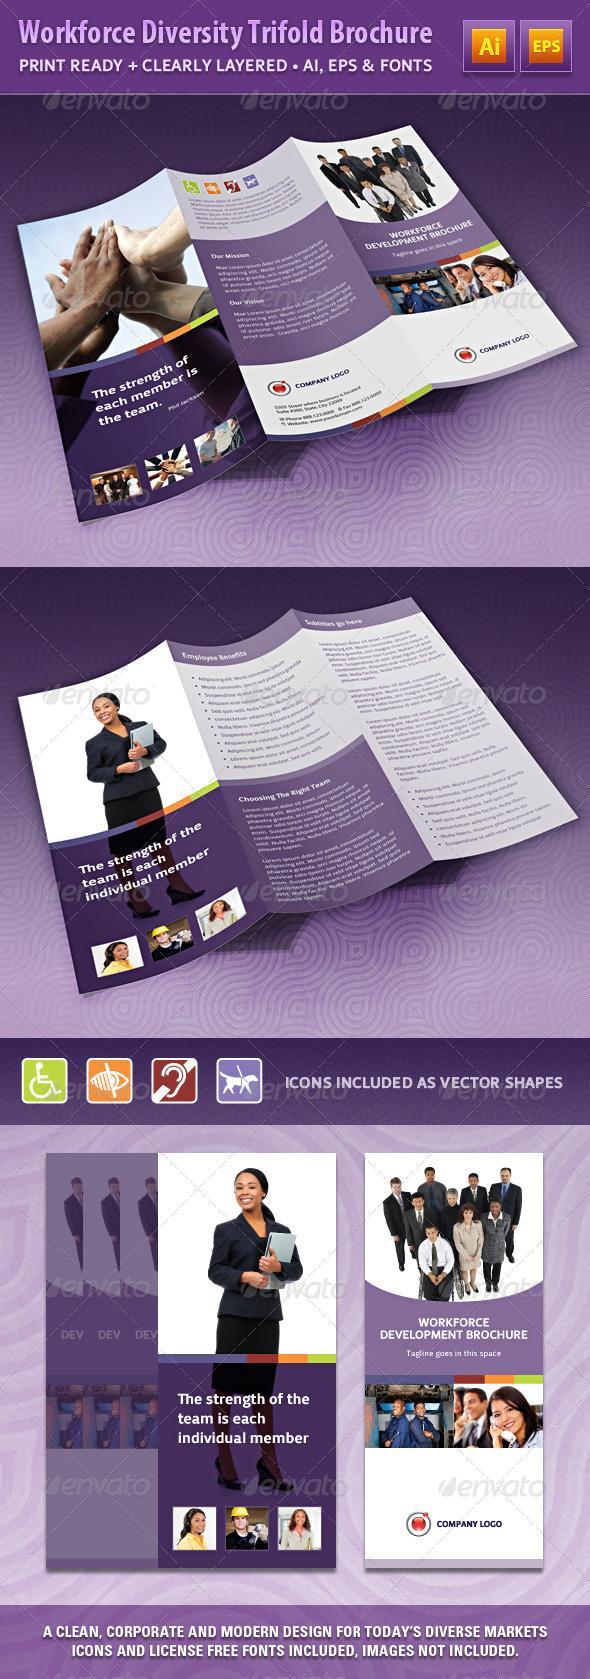 Workforce Diversity Trifold Brochure - Brochures Print